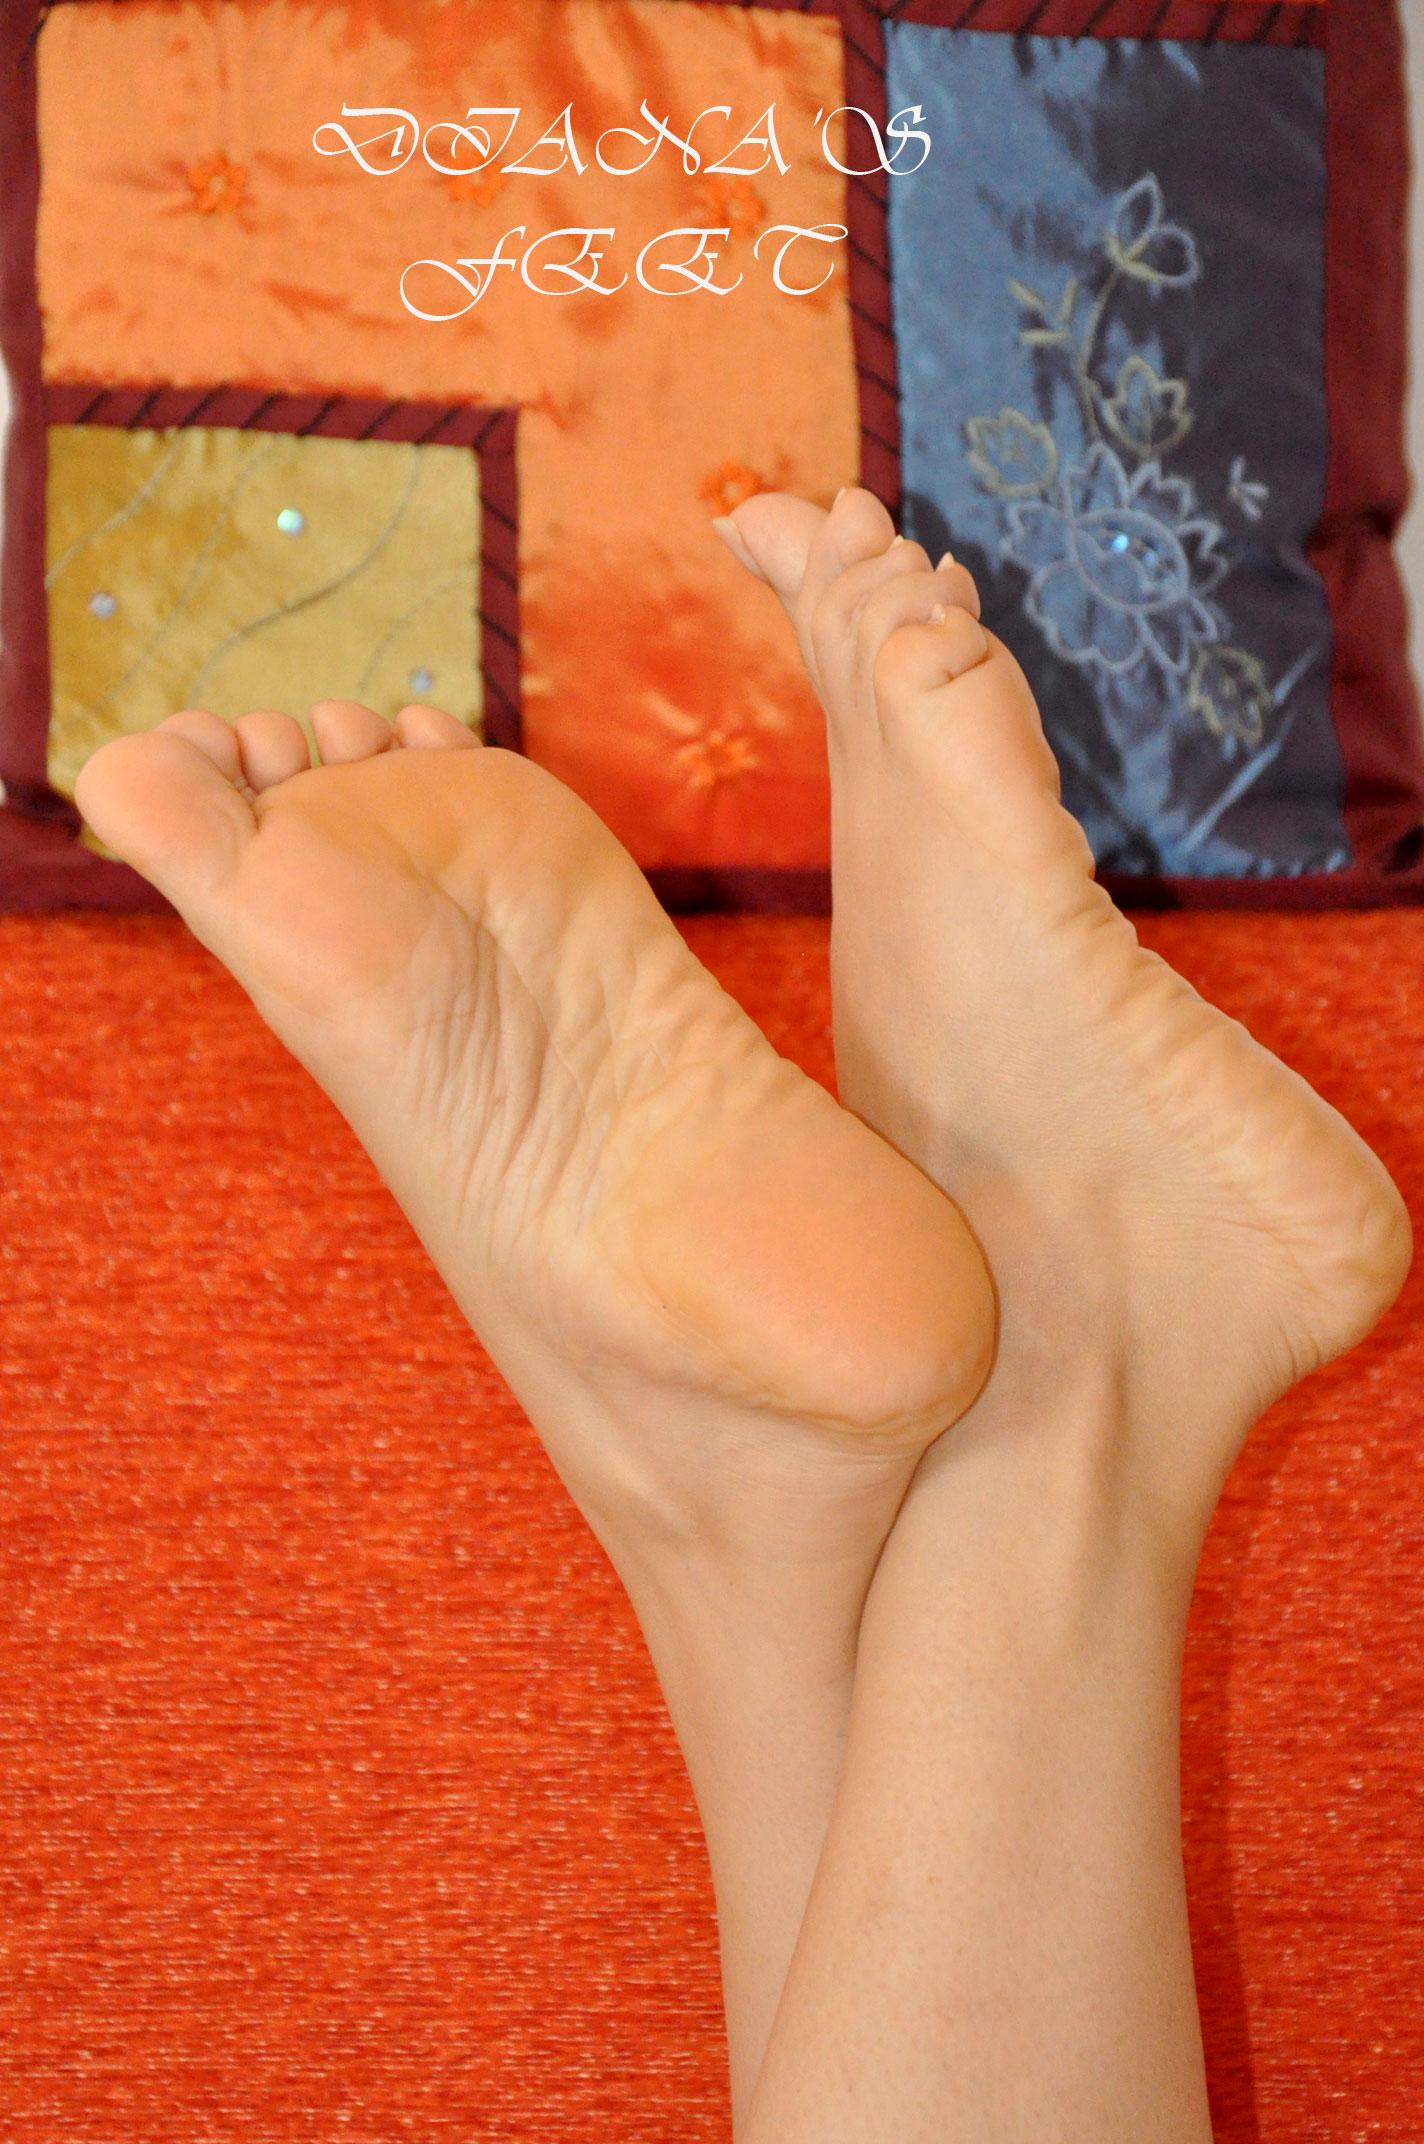 Diana 's feet 171114101802377791